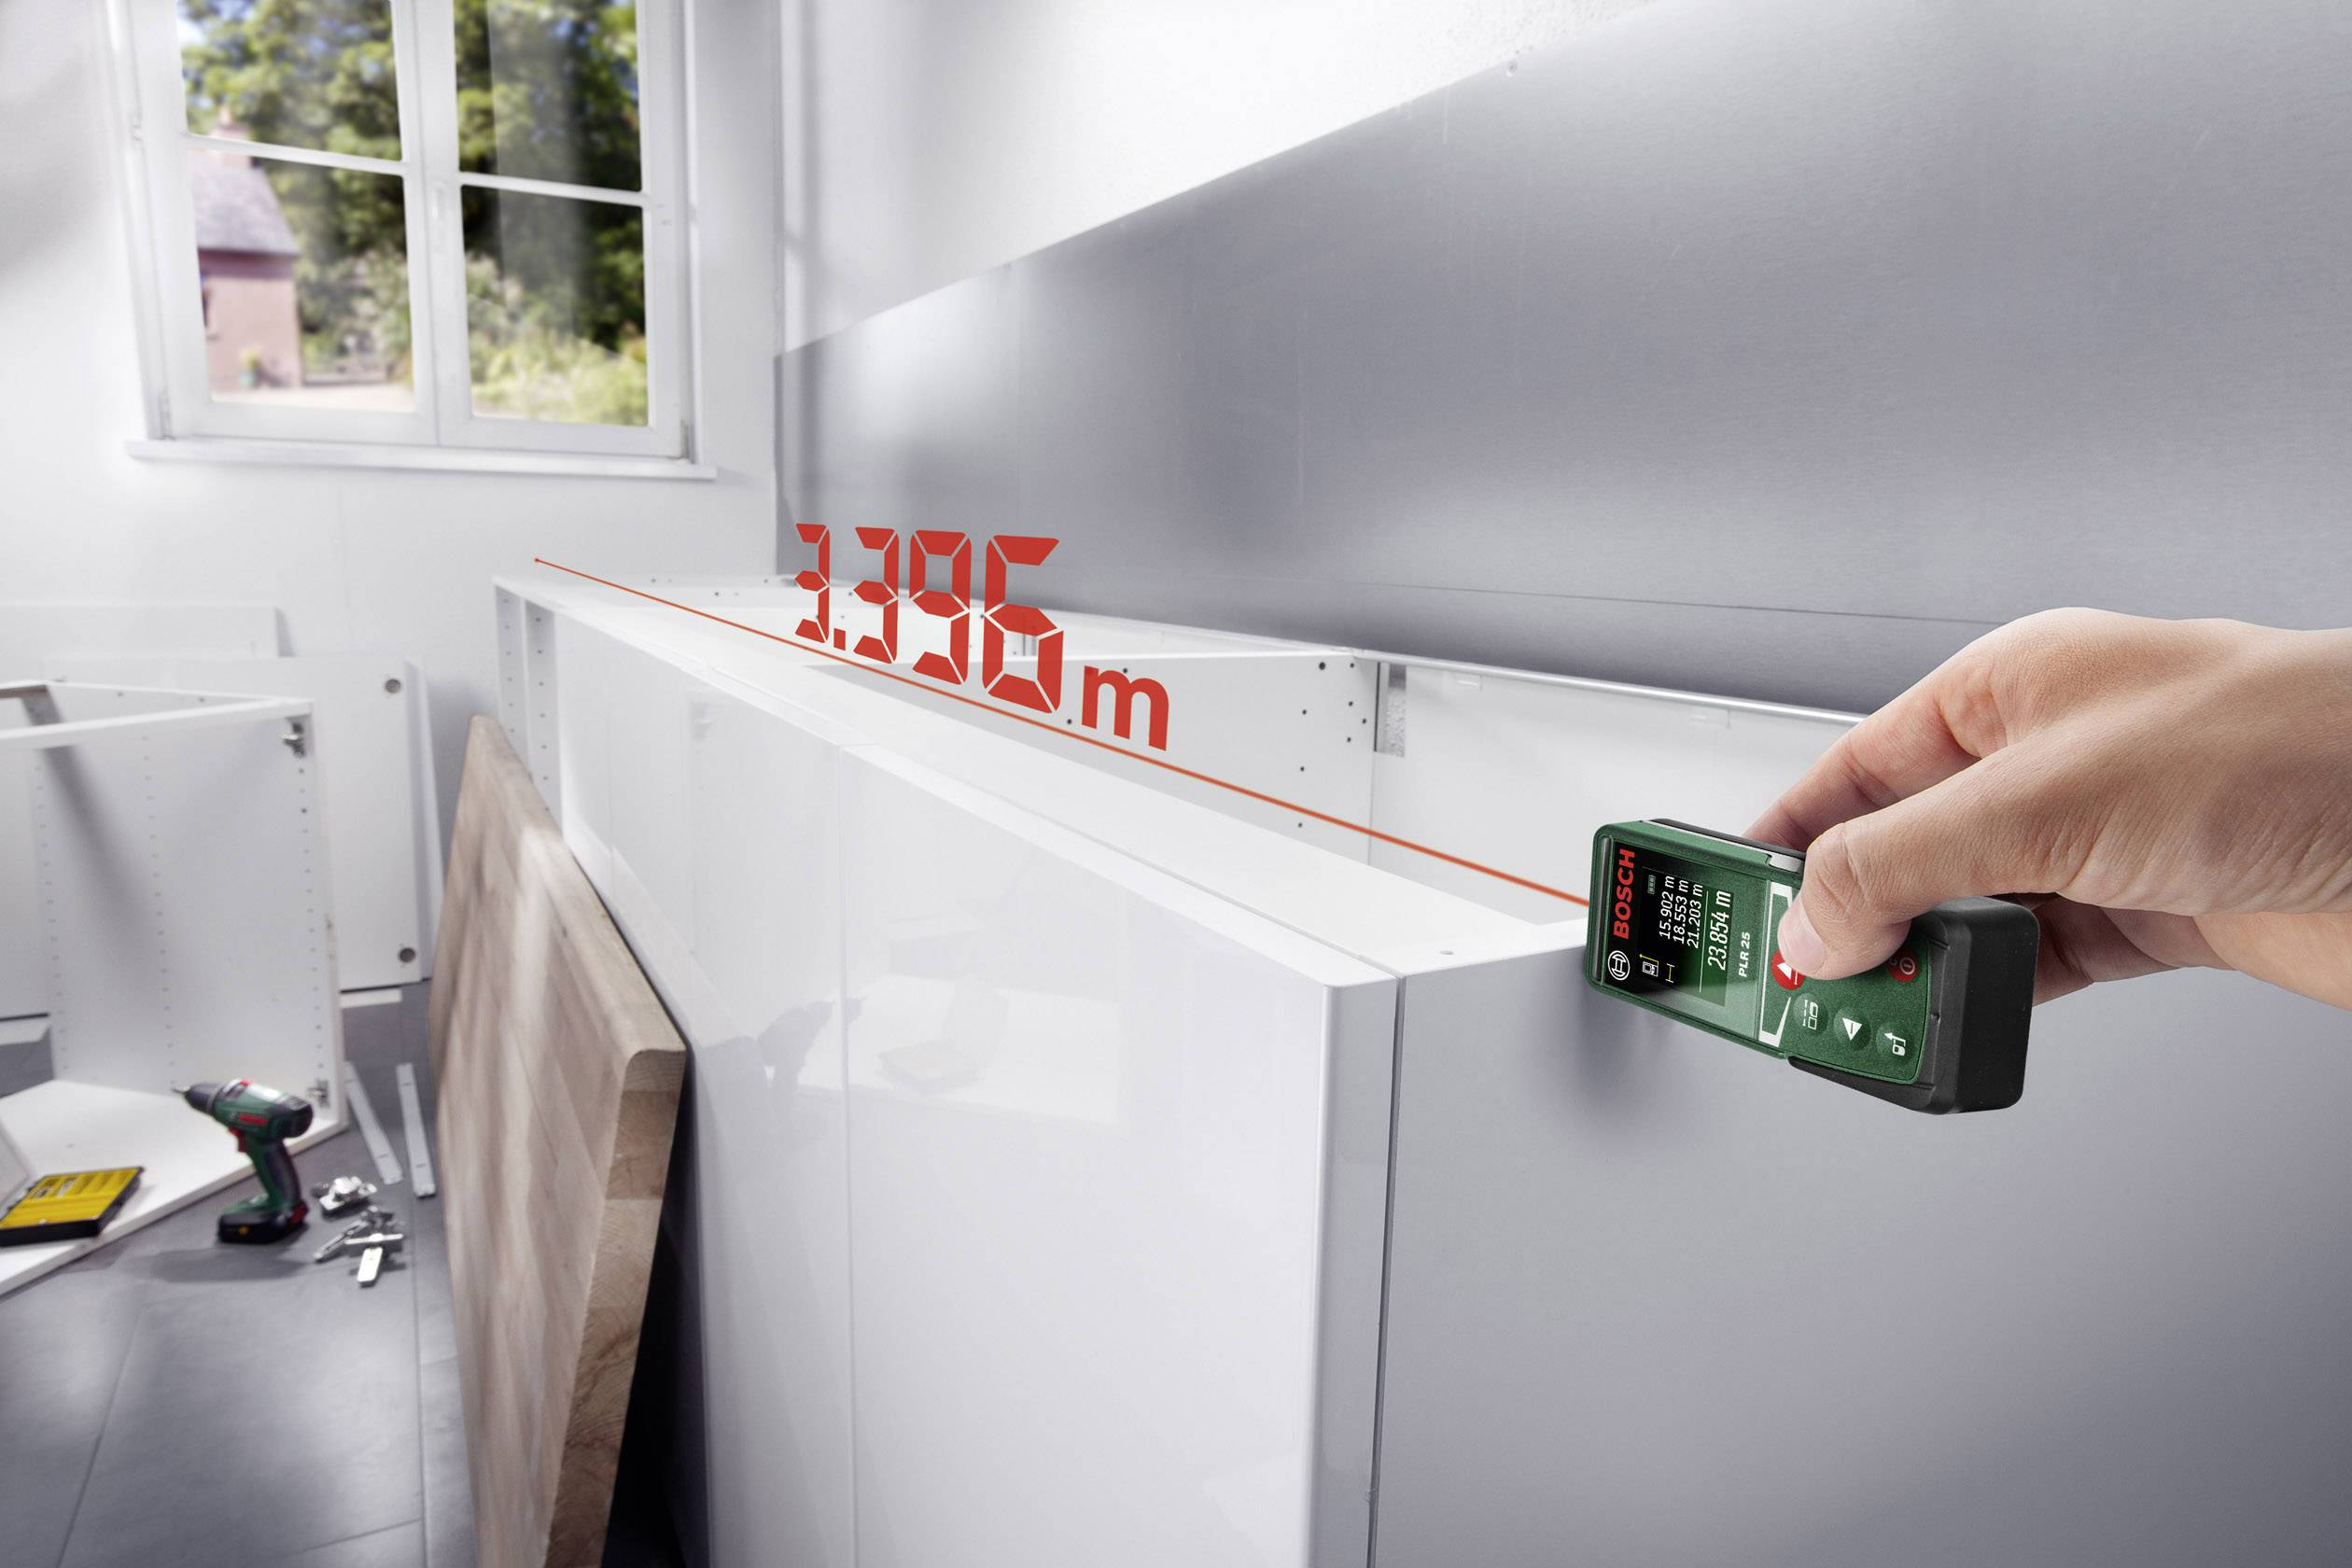 Bosch Entfernungsmesser Zamo 2 : Bosch home and garden plr laser entfernungsmesser messbereich